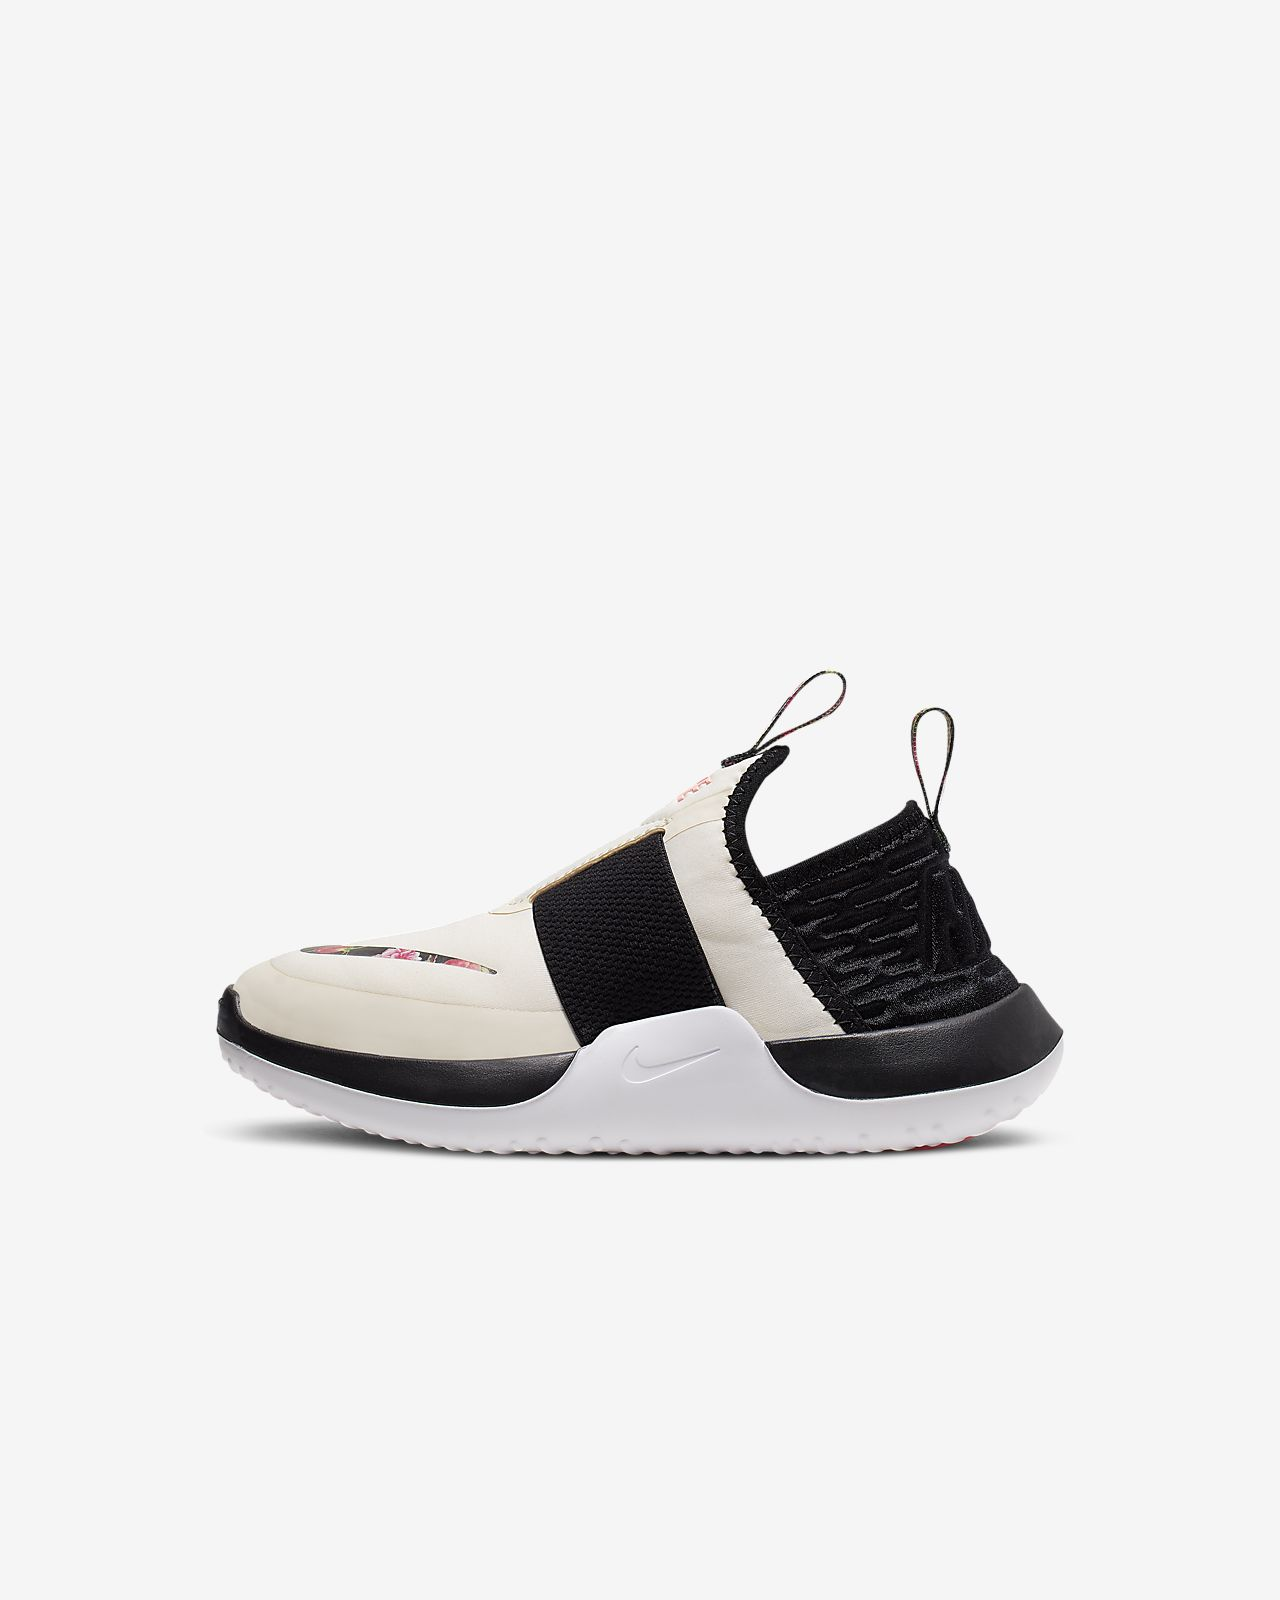 Nike NitrofloVF (PS)幼童运动童鞋